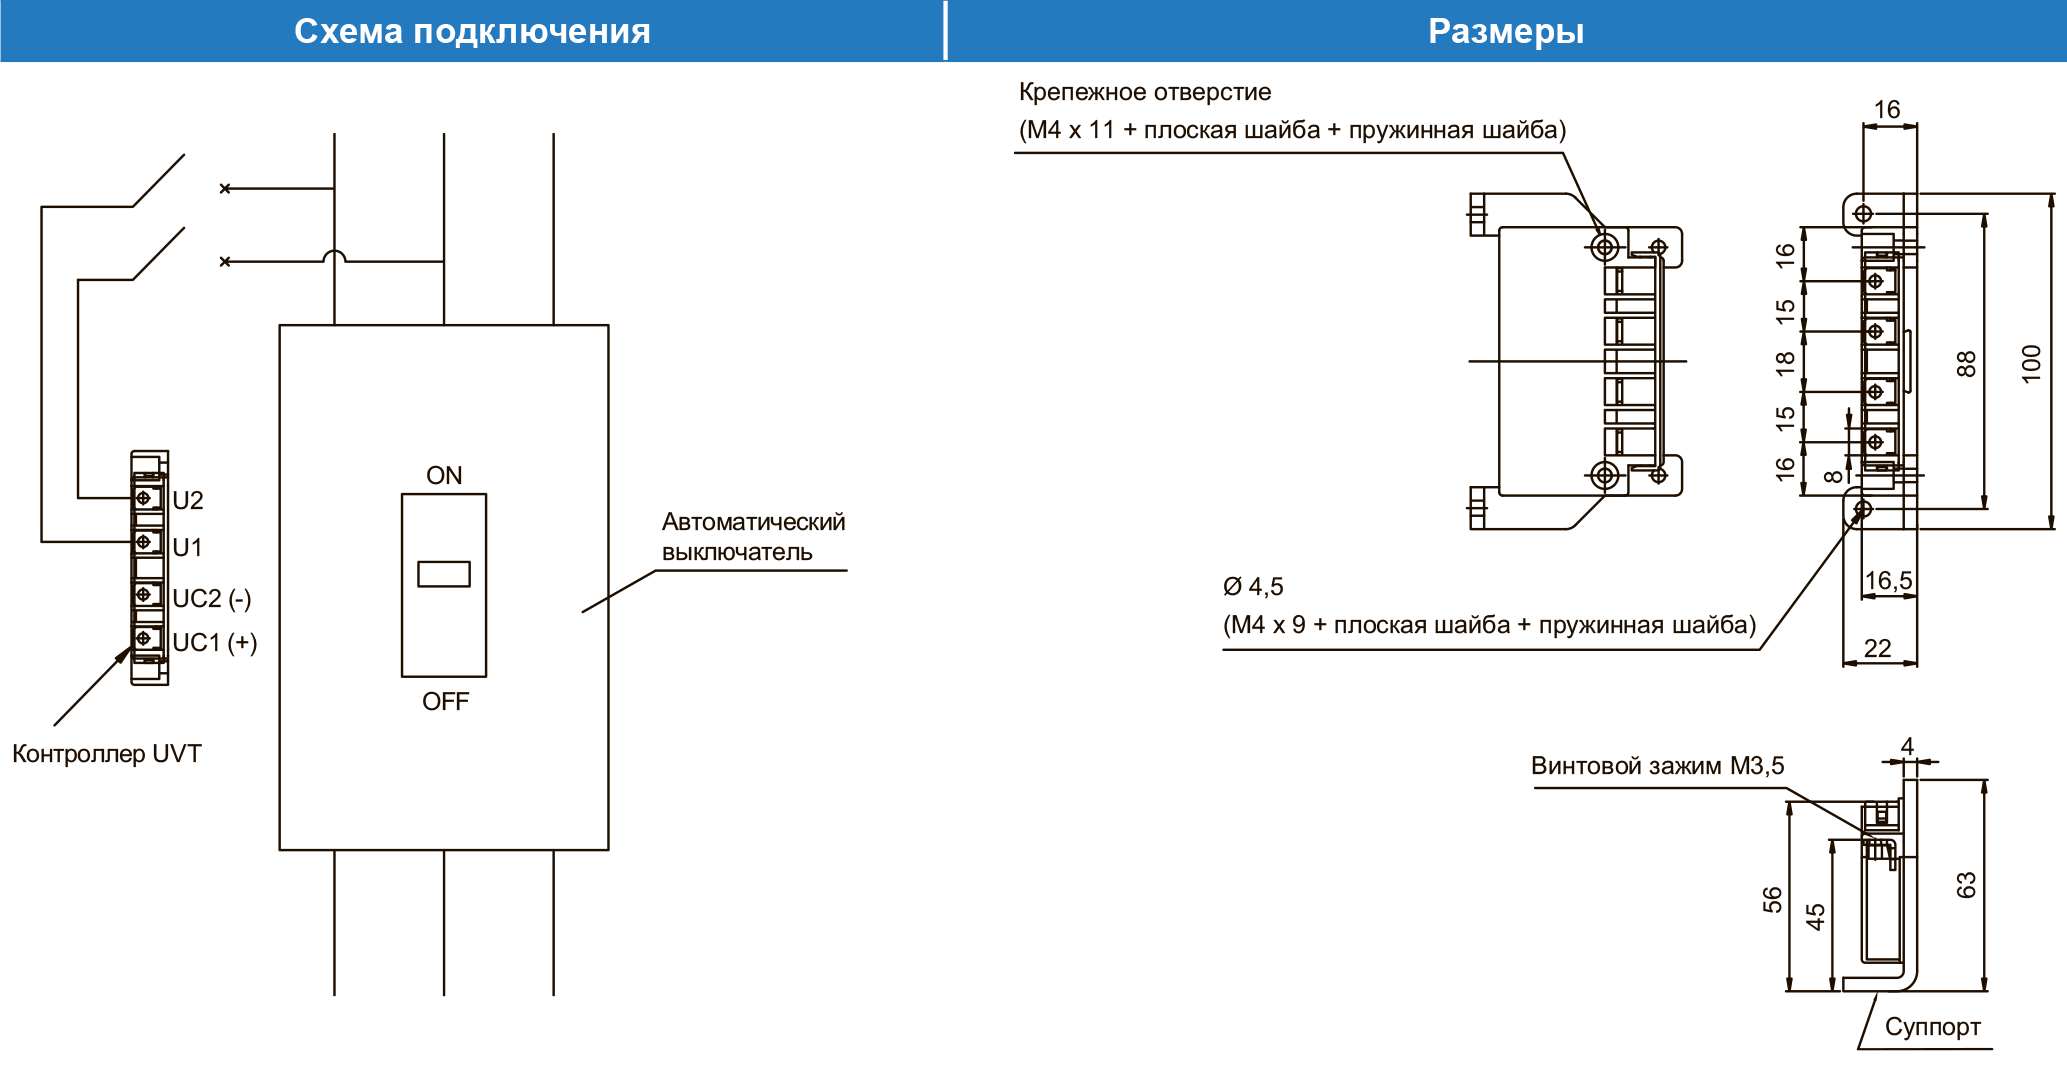 Монтаж расцепителя напряжения через контроллер